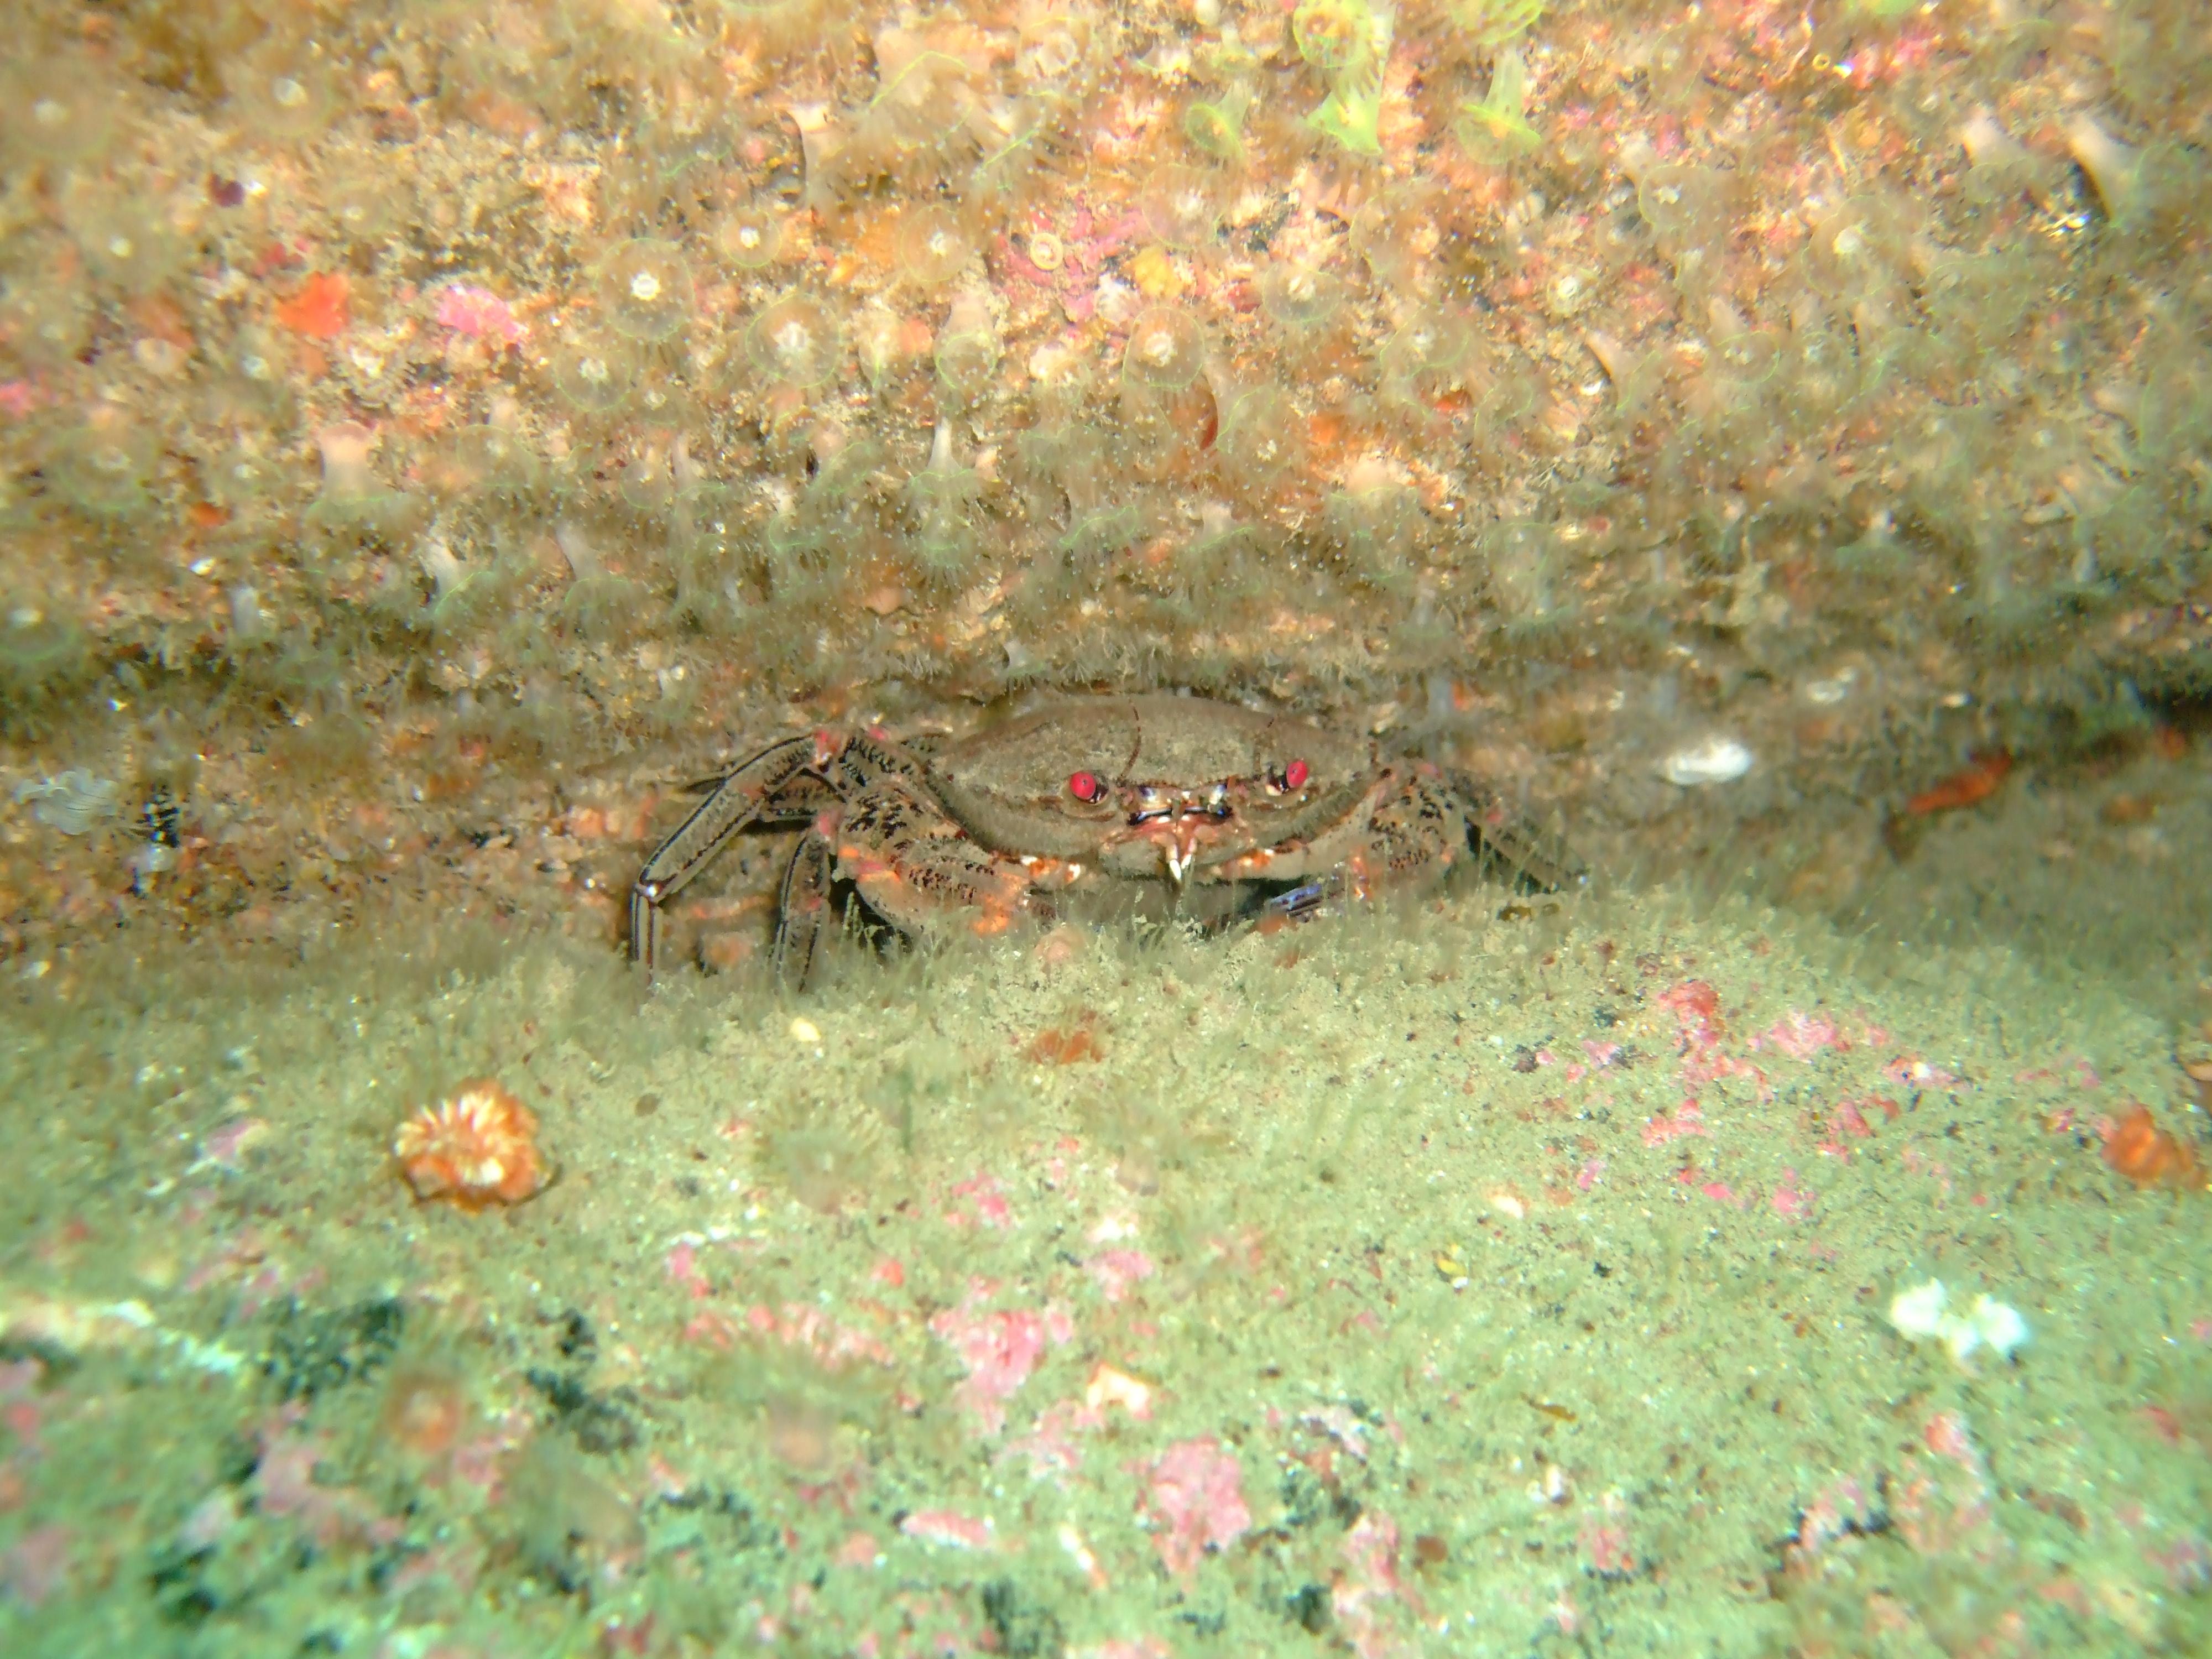 Velvet swimming crab (Necora puber)